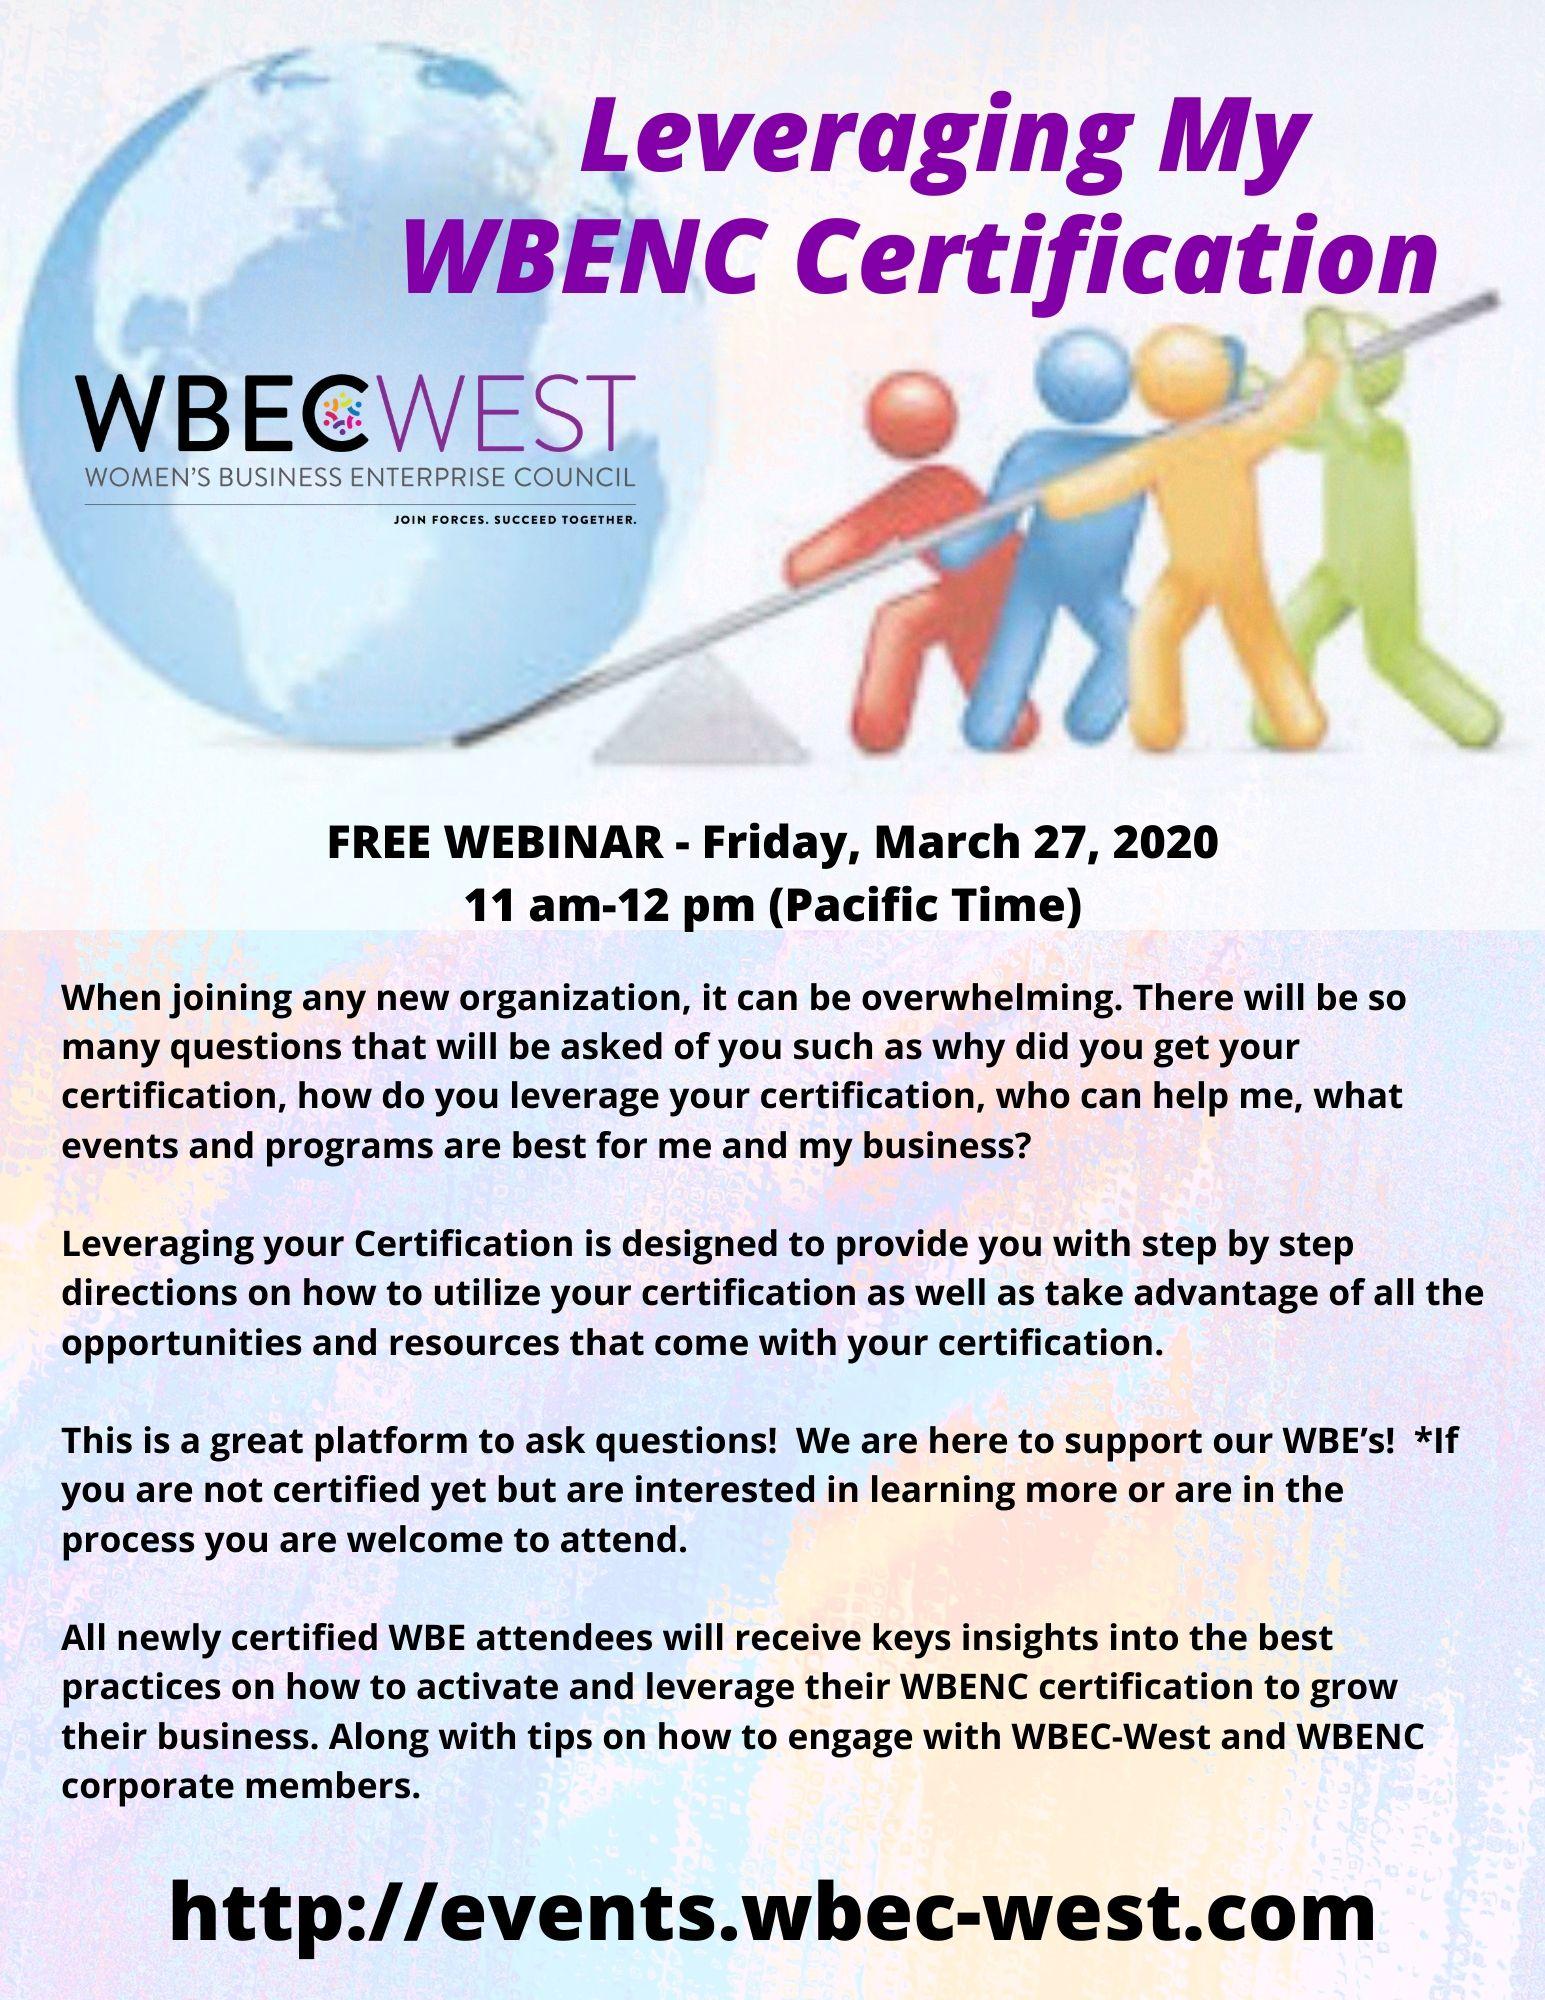 Leverage My WBENC Certification